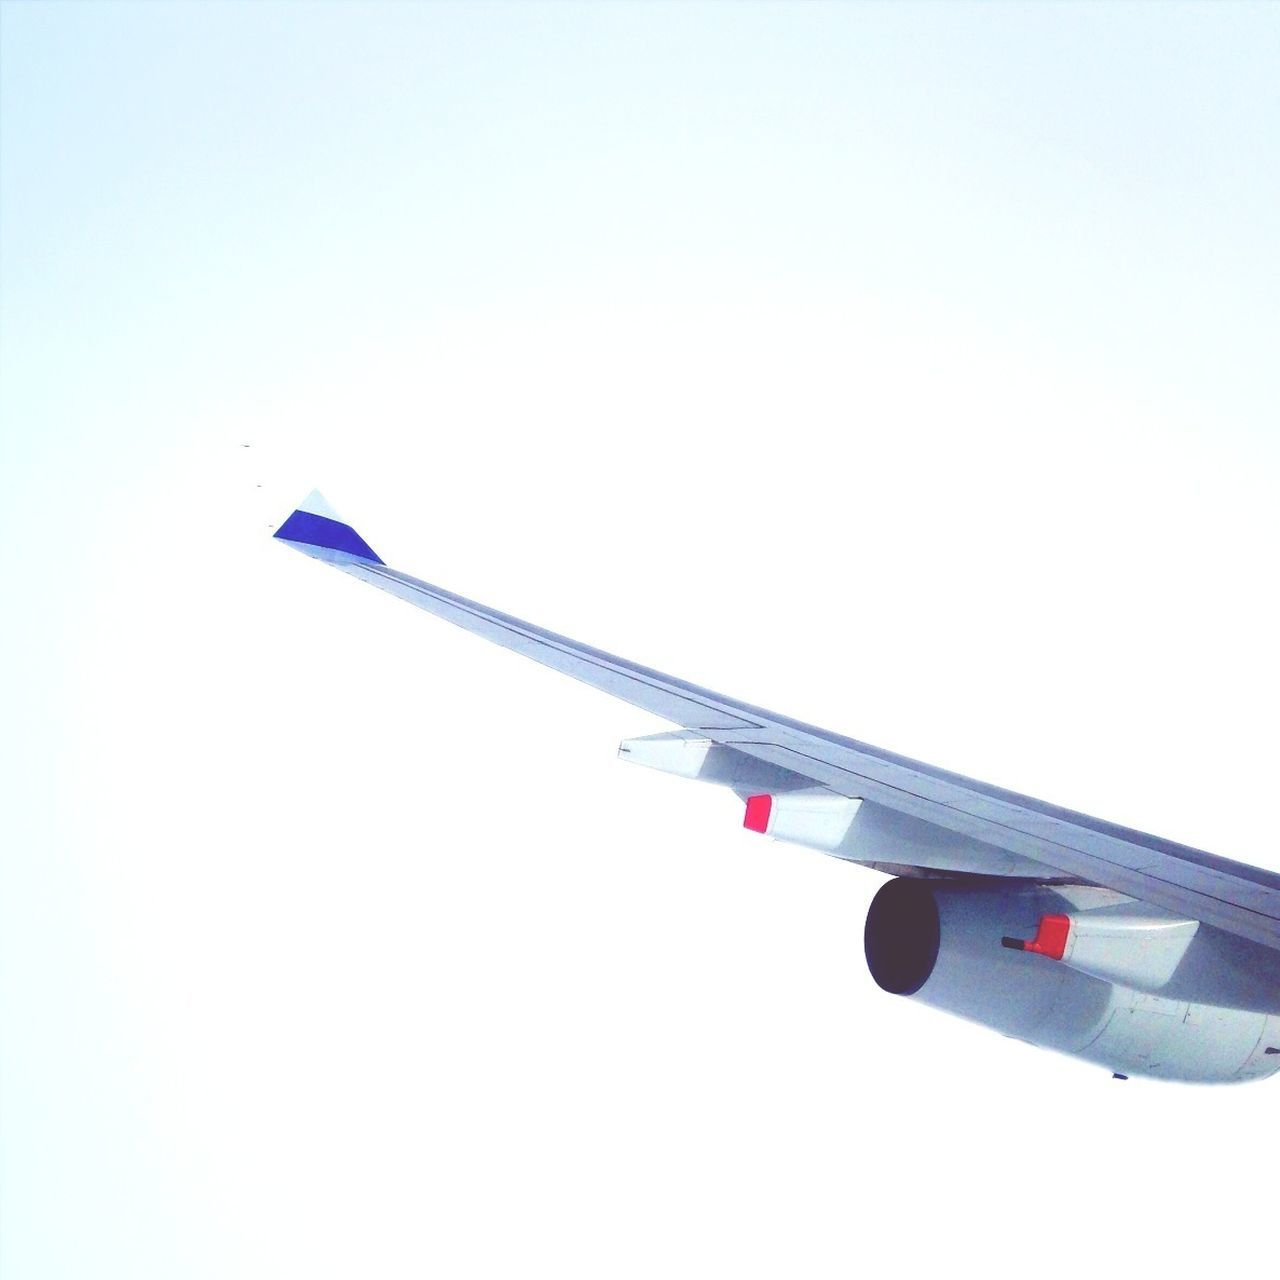 Airplane Simplicity Wings Supernormal